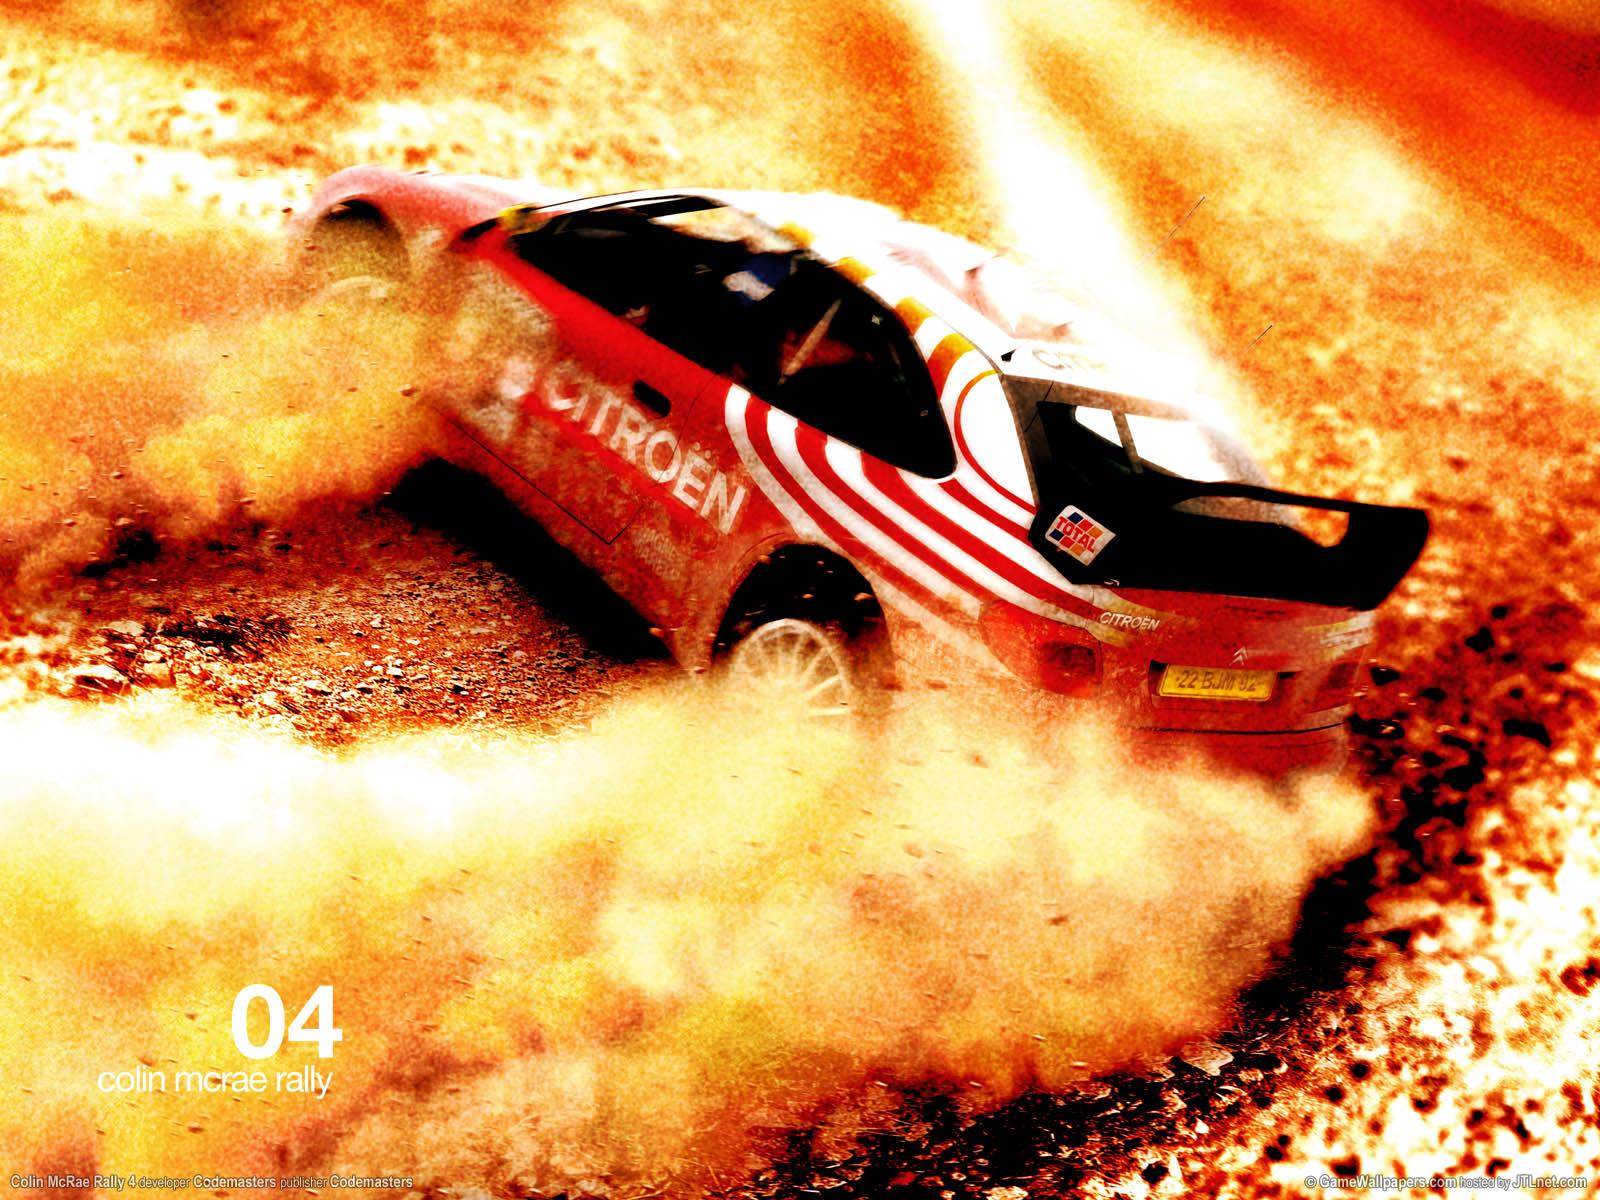 Colin McRae Rally 4 Hintergrundbild 04 1600x1200